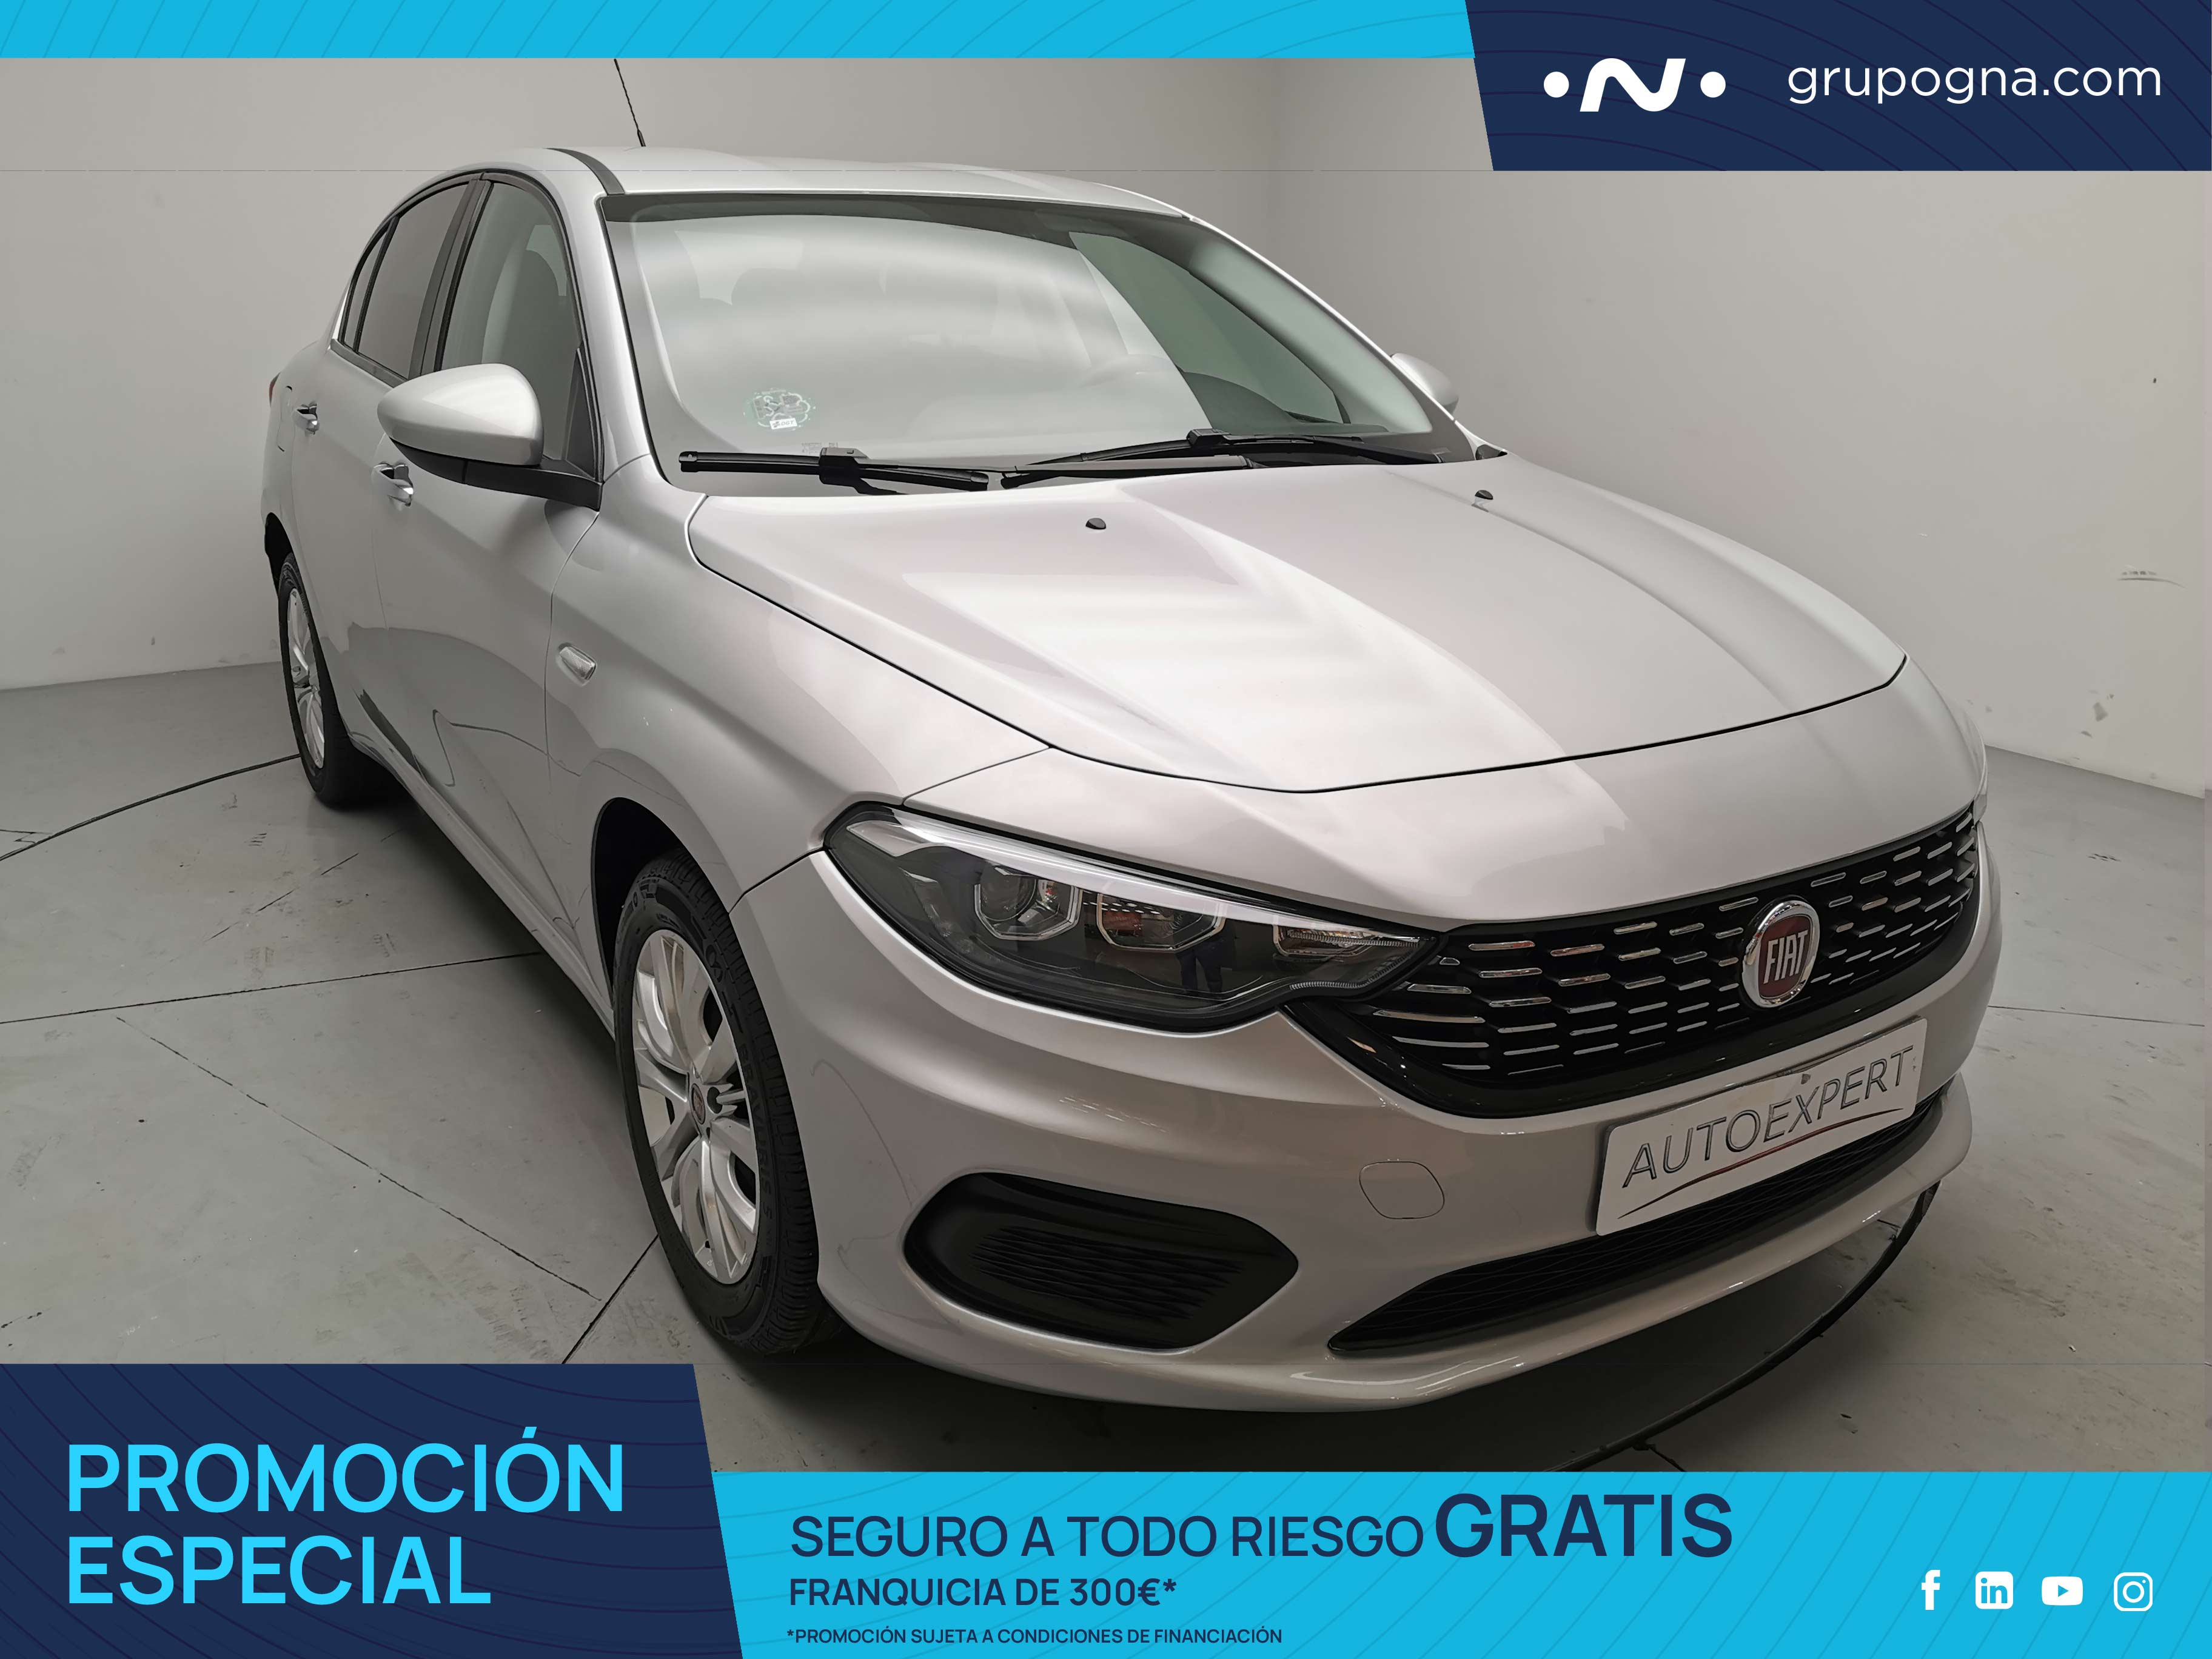 Fiat Tipo ocasión segunda mano 2019 Gasolina por 10.990€ en Málaga